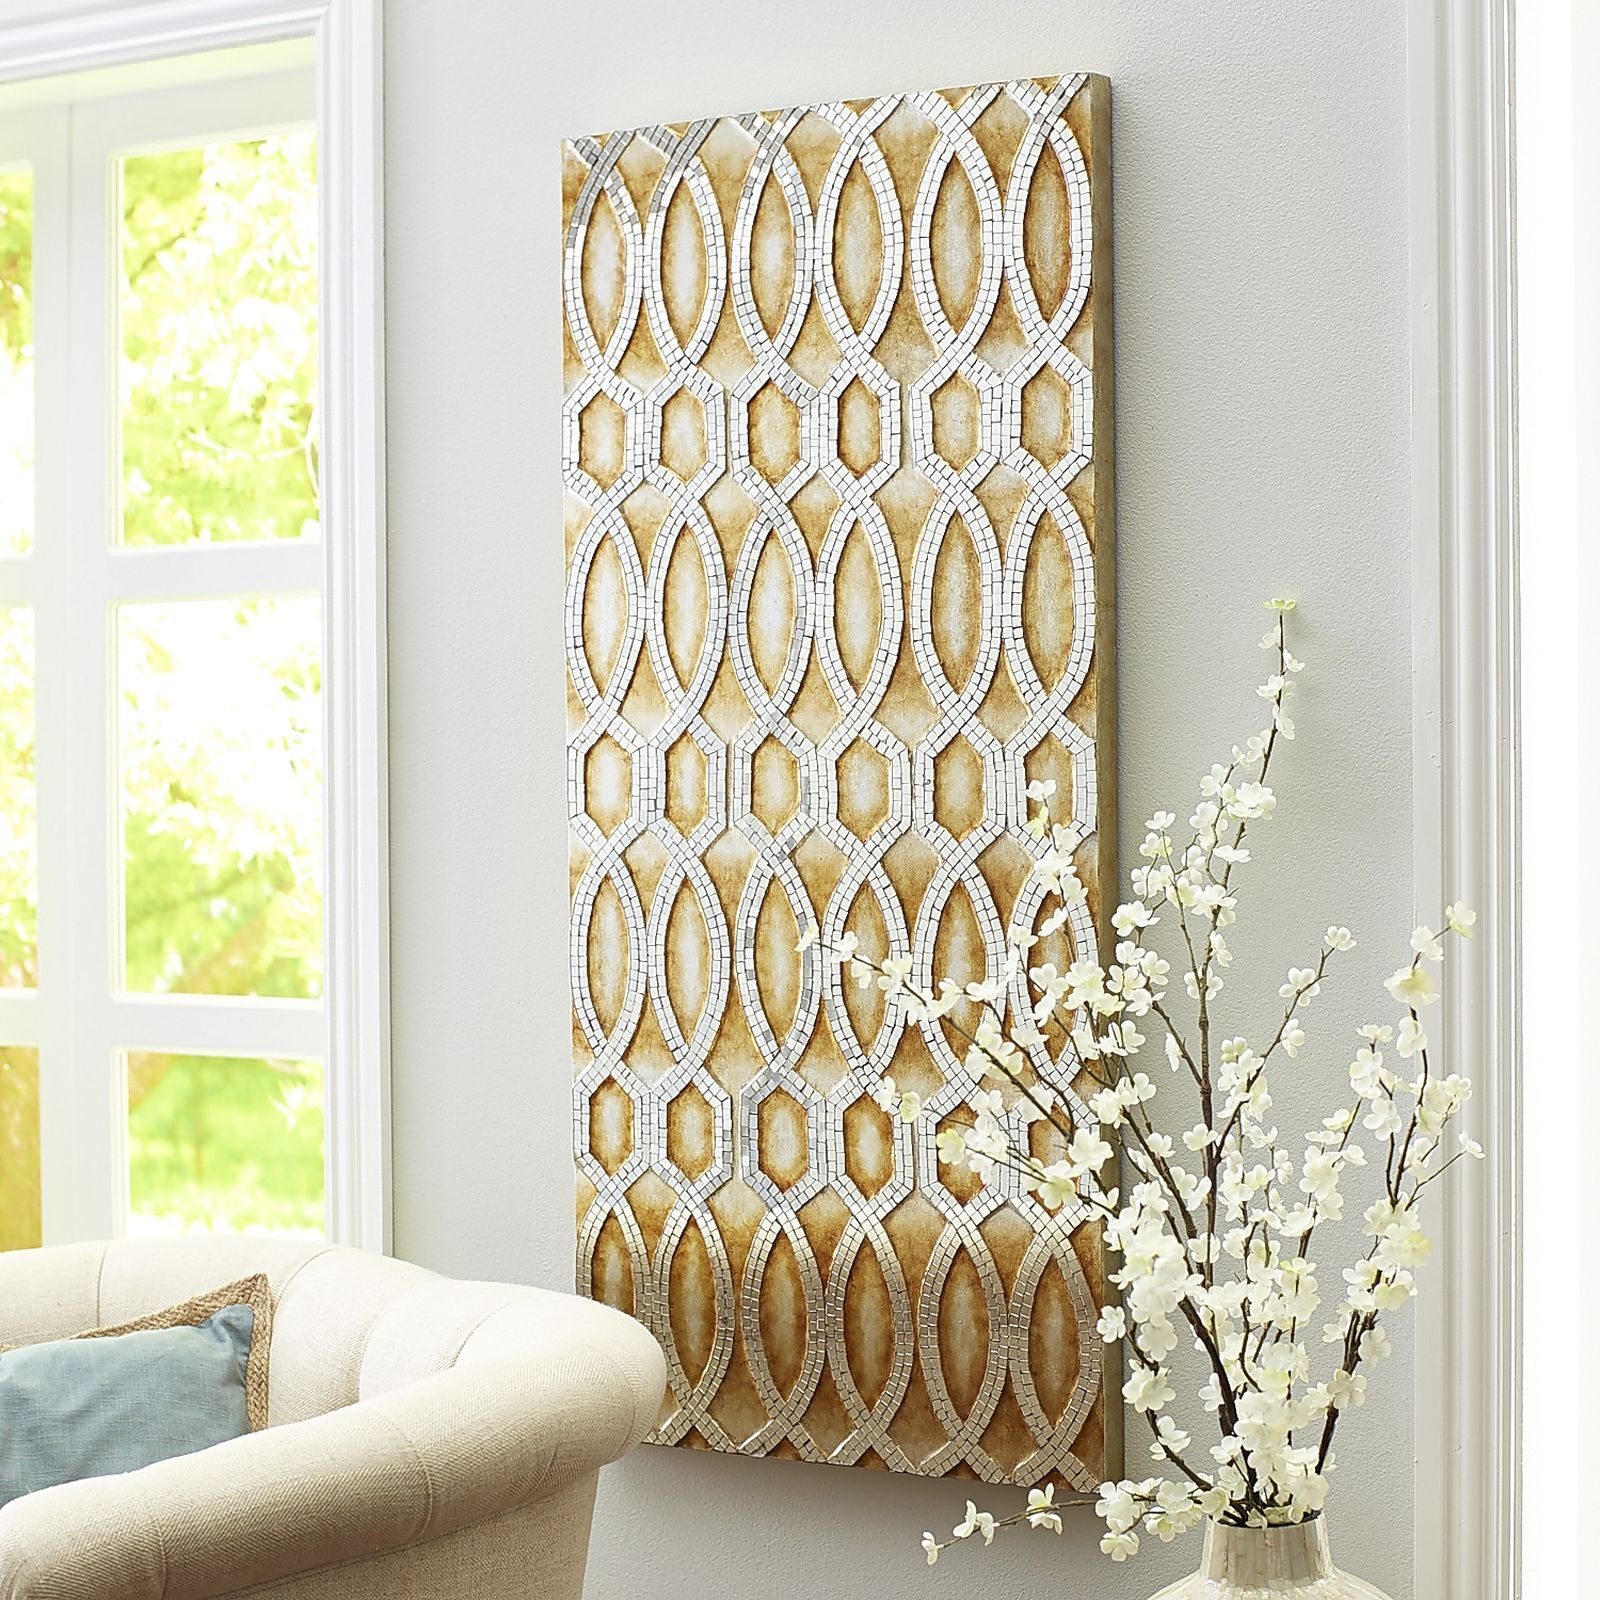 Pesci Geometric Mosaic Panel - Champagne | Pier 1 Imports | Ideas ...